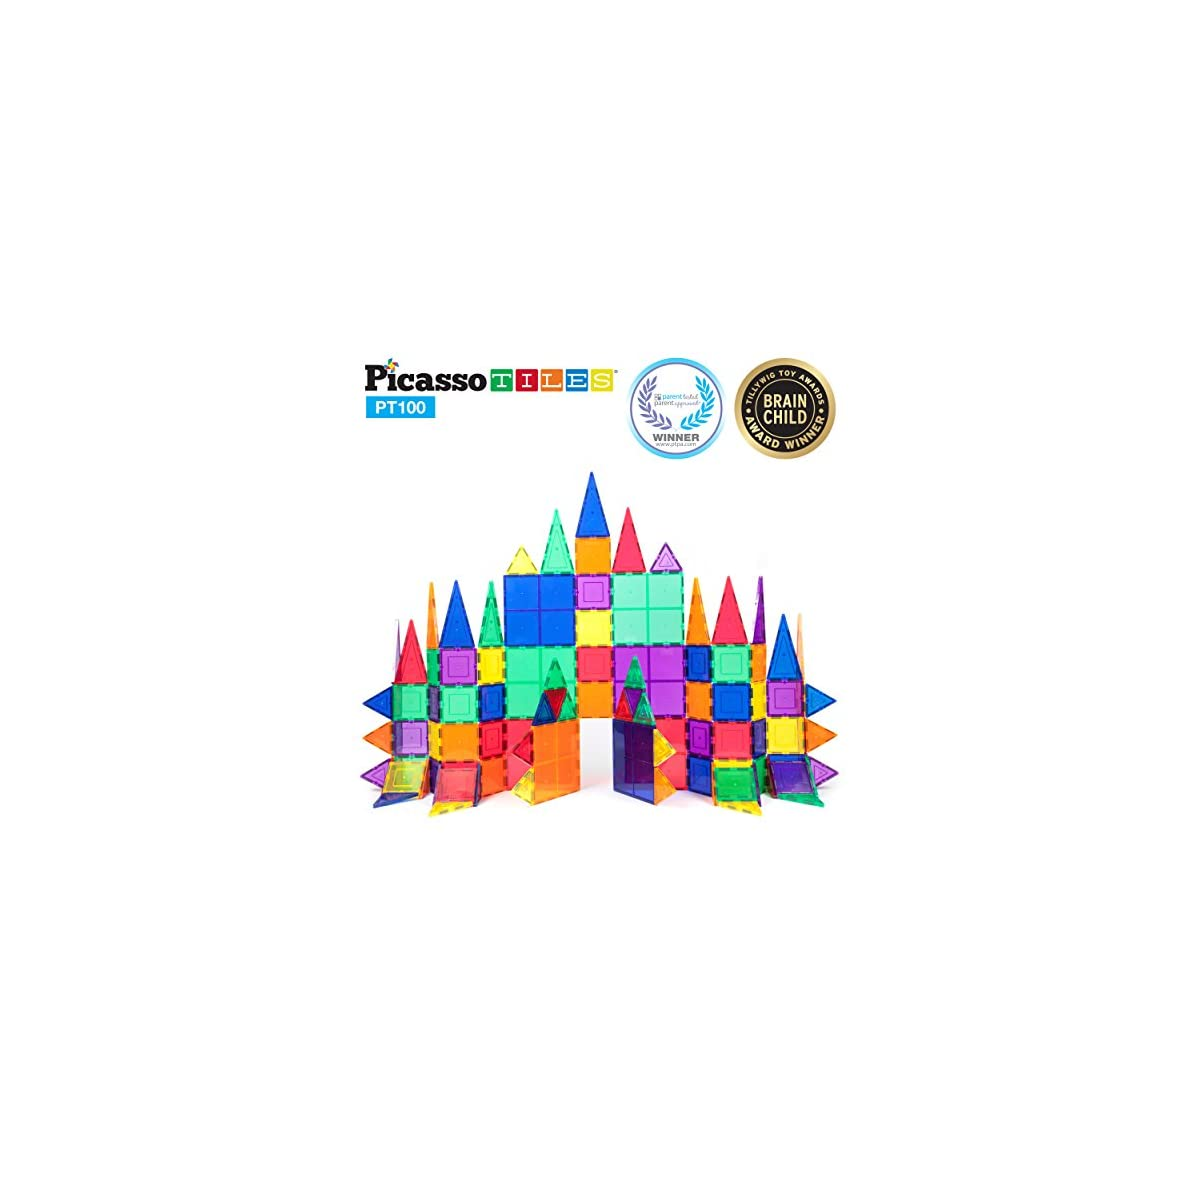 SaleProductsOffer - No.1 Best Online Store 51CIMPeqDqL PicassoTiles 100 Piece Set 100pcs Magnet Building Tiles Clear Magnetic 3D Building Blocks Construction Playboards, Creativity beyond Imagination, Inspirational, Recreational, Educational Conventional